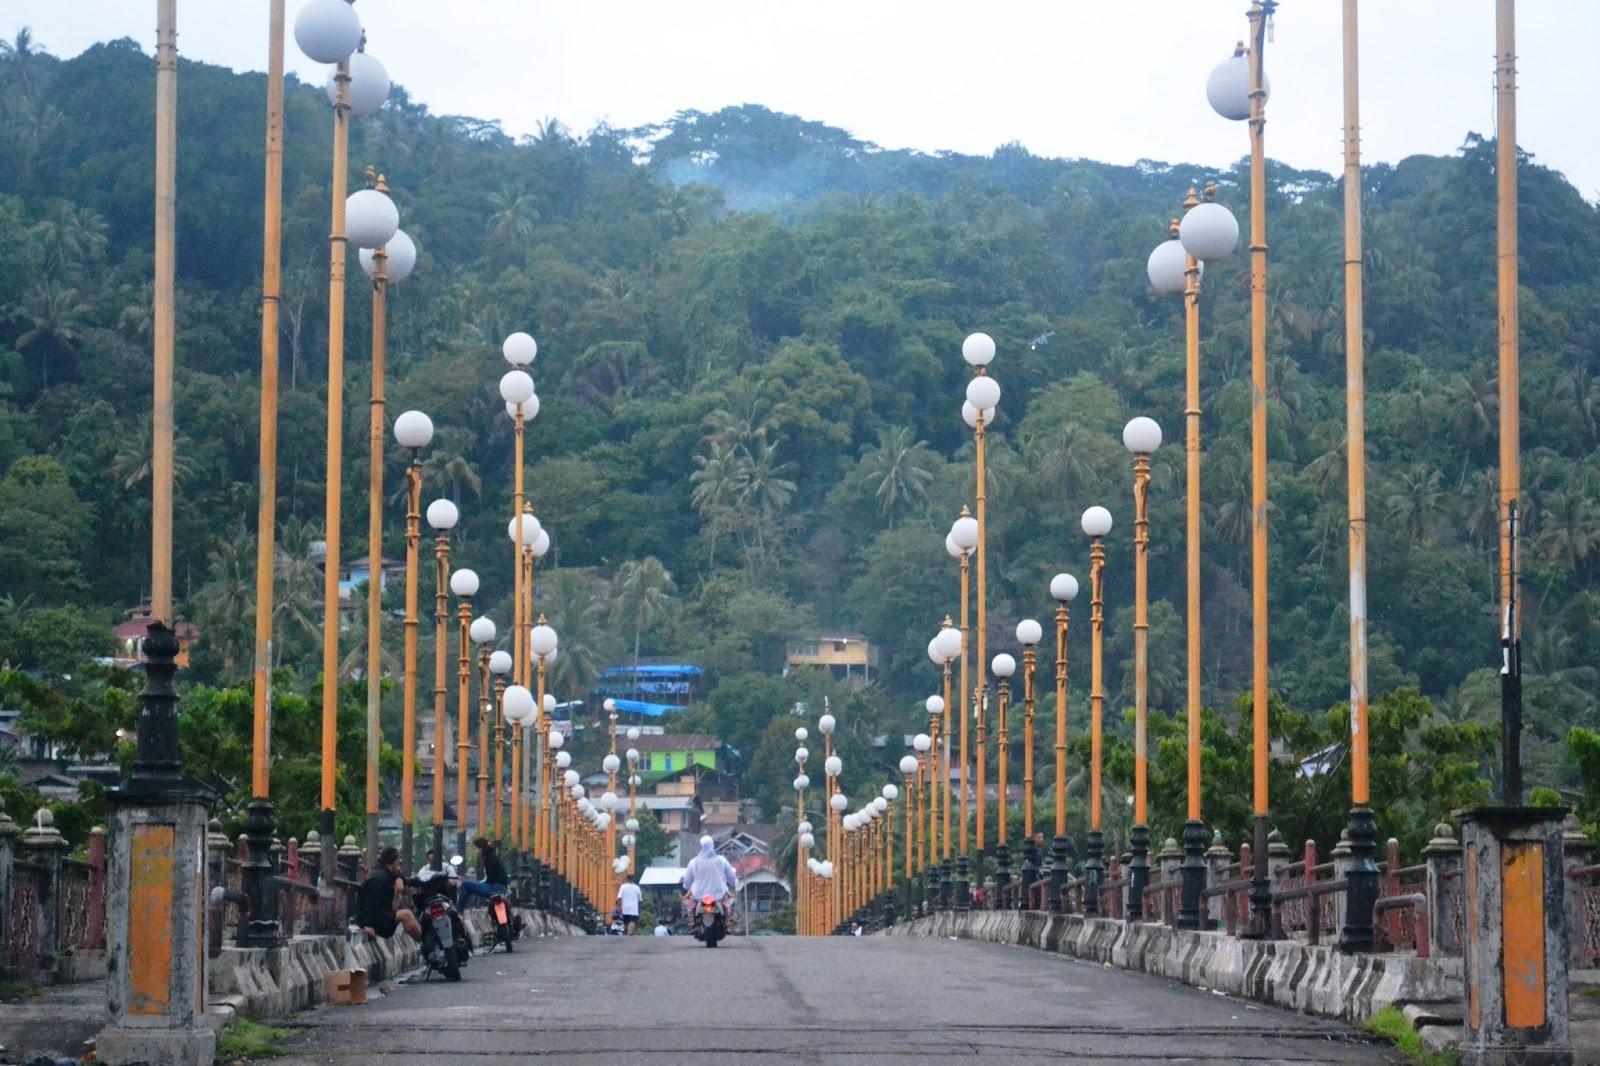 Lima Alasan Bertandang Jembatan Siti Nurbaya Padang Sumatera Barat Teman